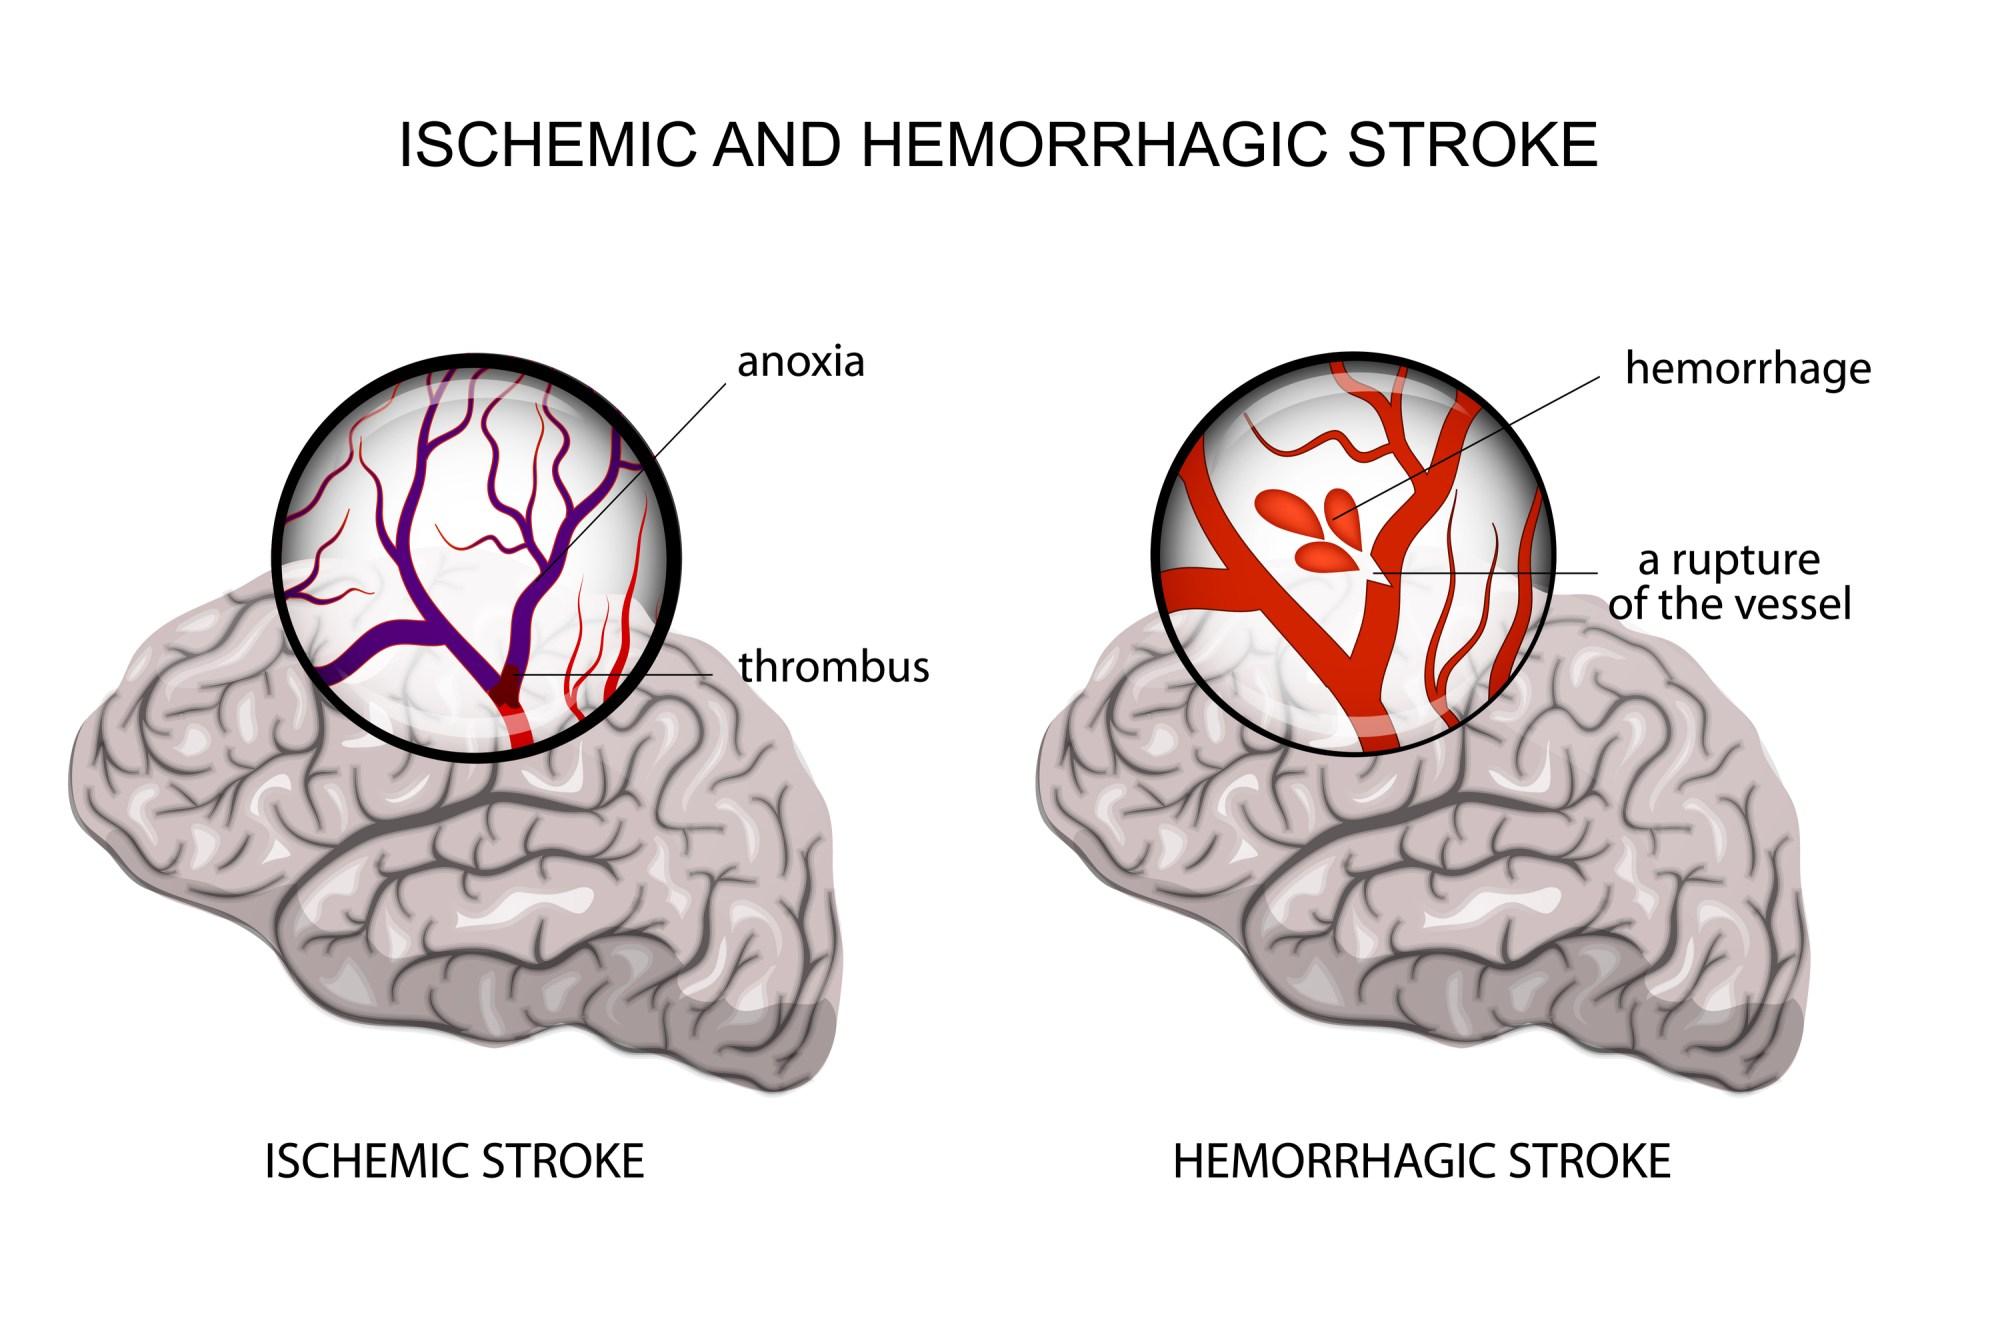 hight resolution of ischemic and hemorrhagic stroke pinterest